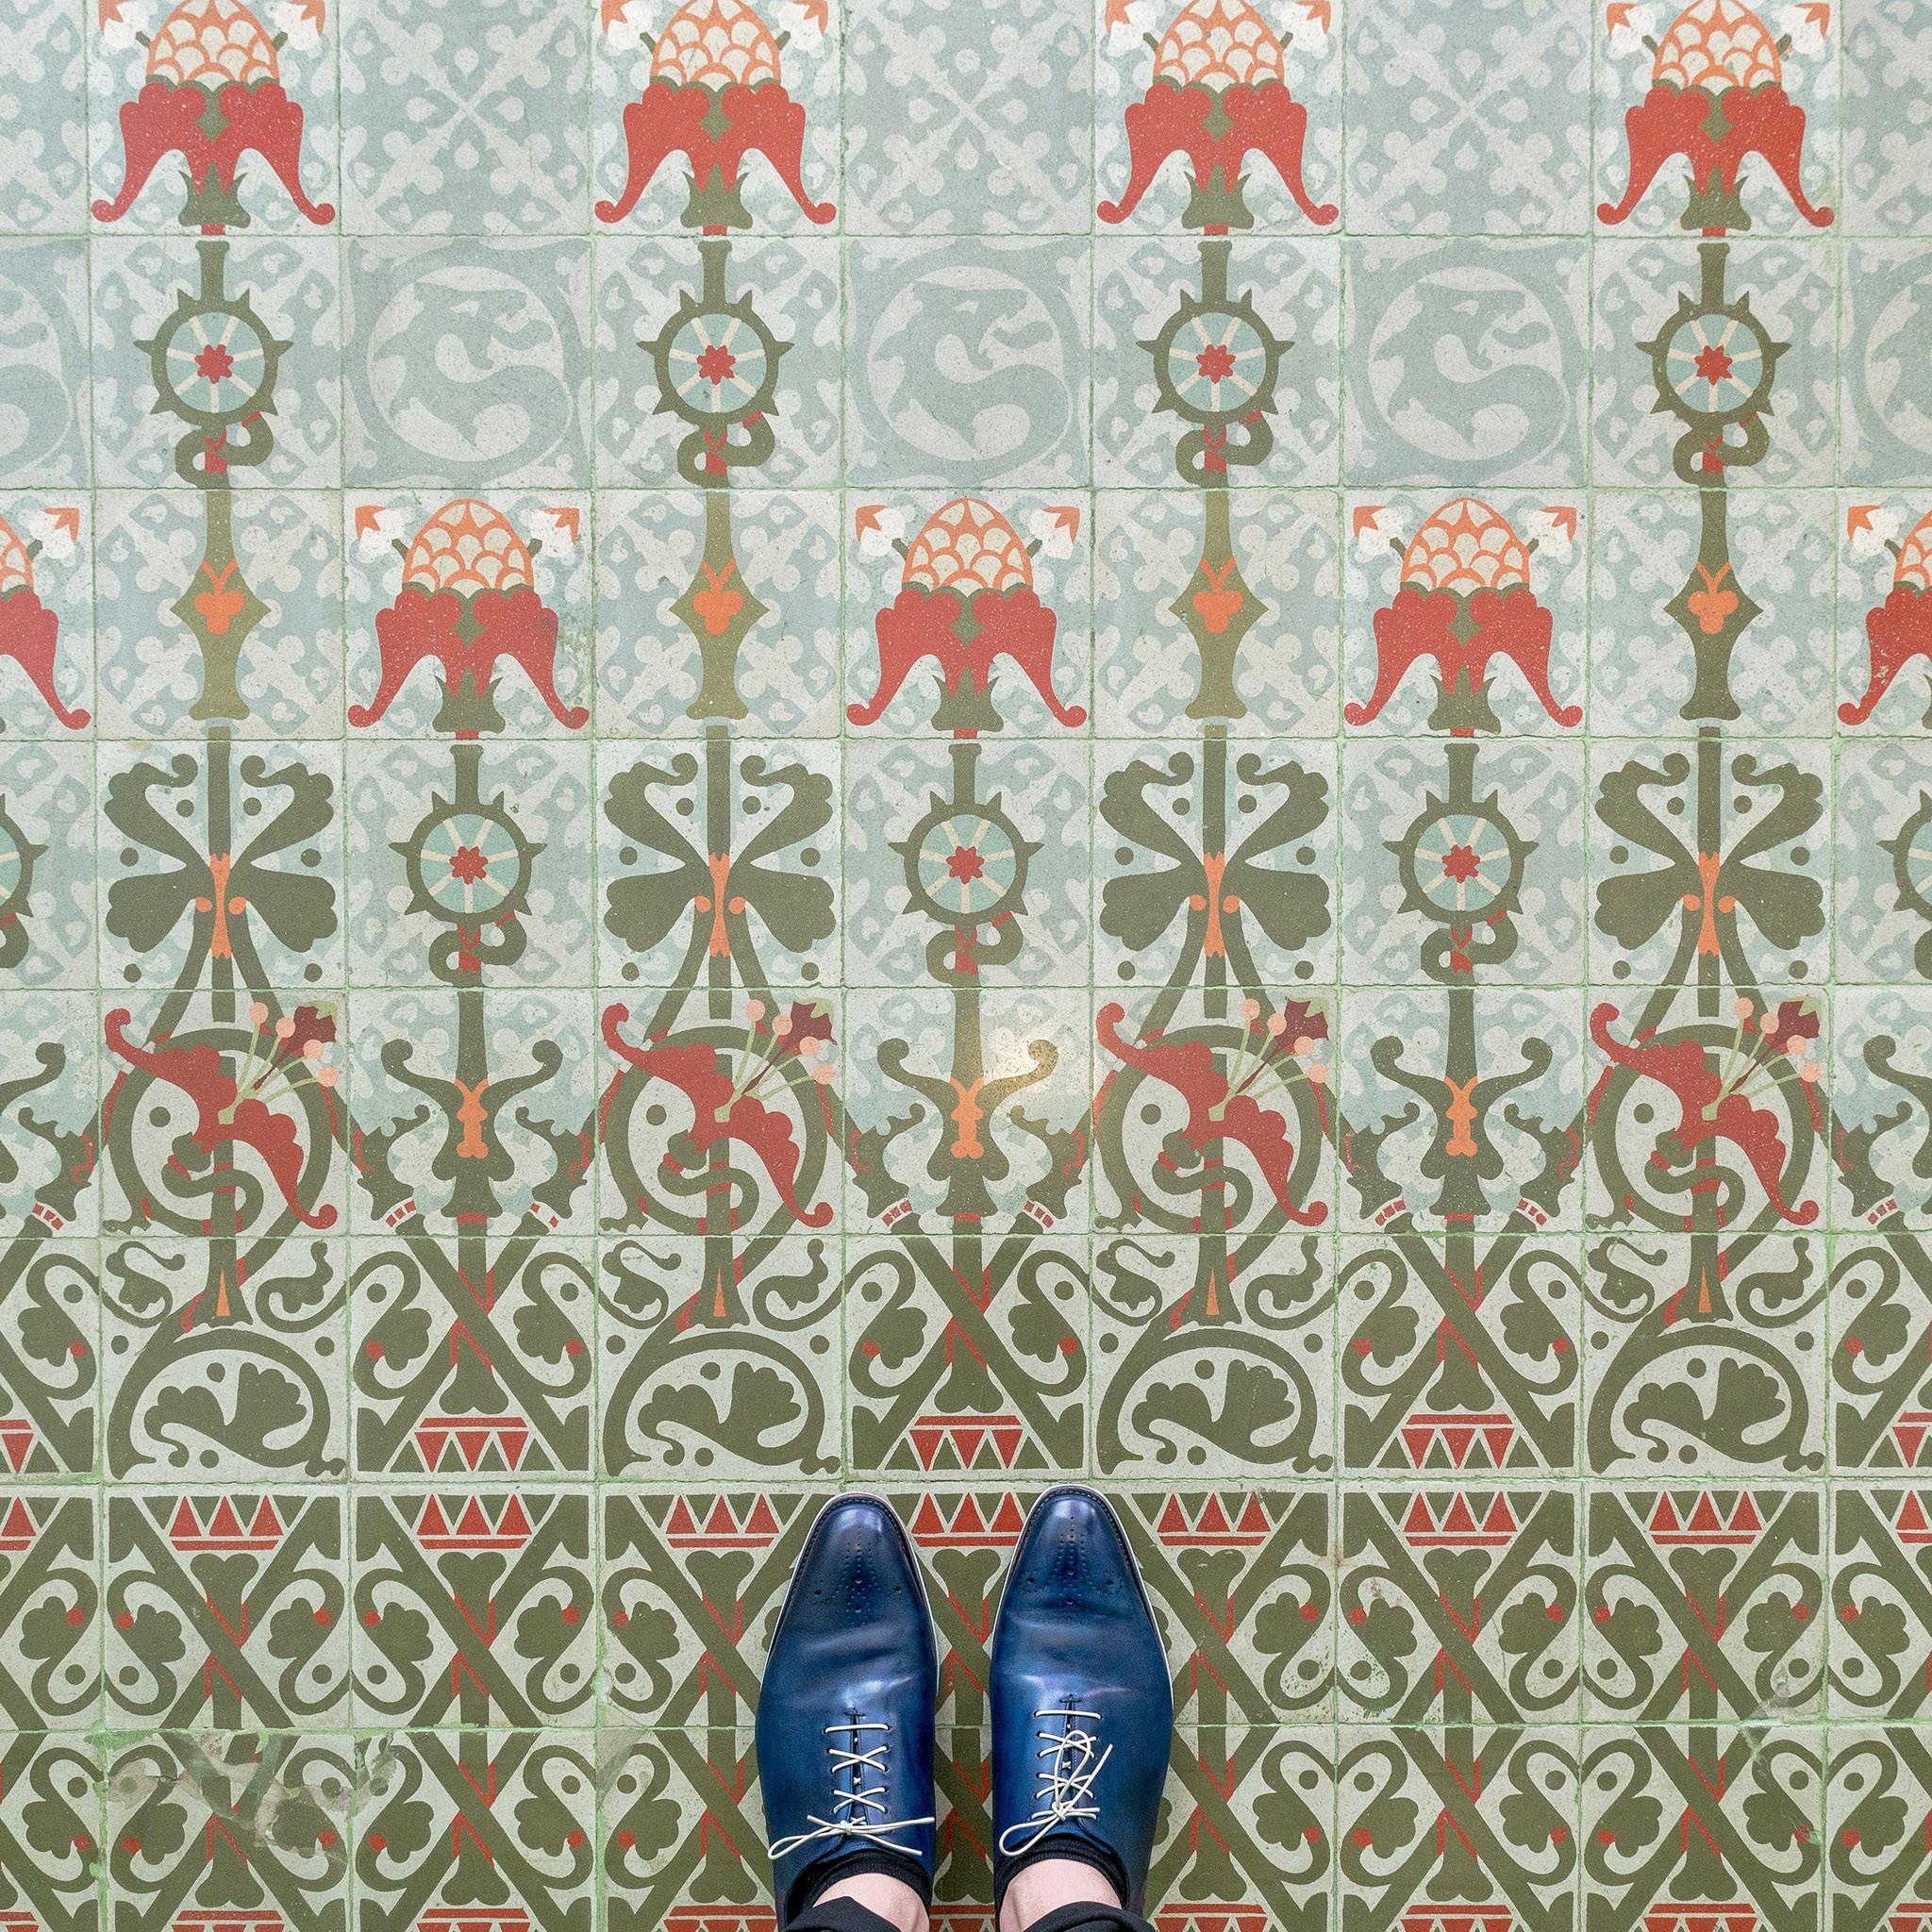 barcelonafloors lleomorera 86 - به پایین نگاه کنید ! به زیبایی کفپوش های خیره کننده بارسلونا   Barcelona